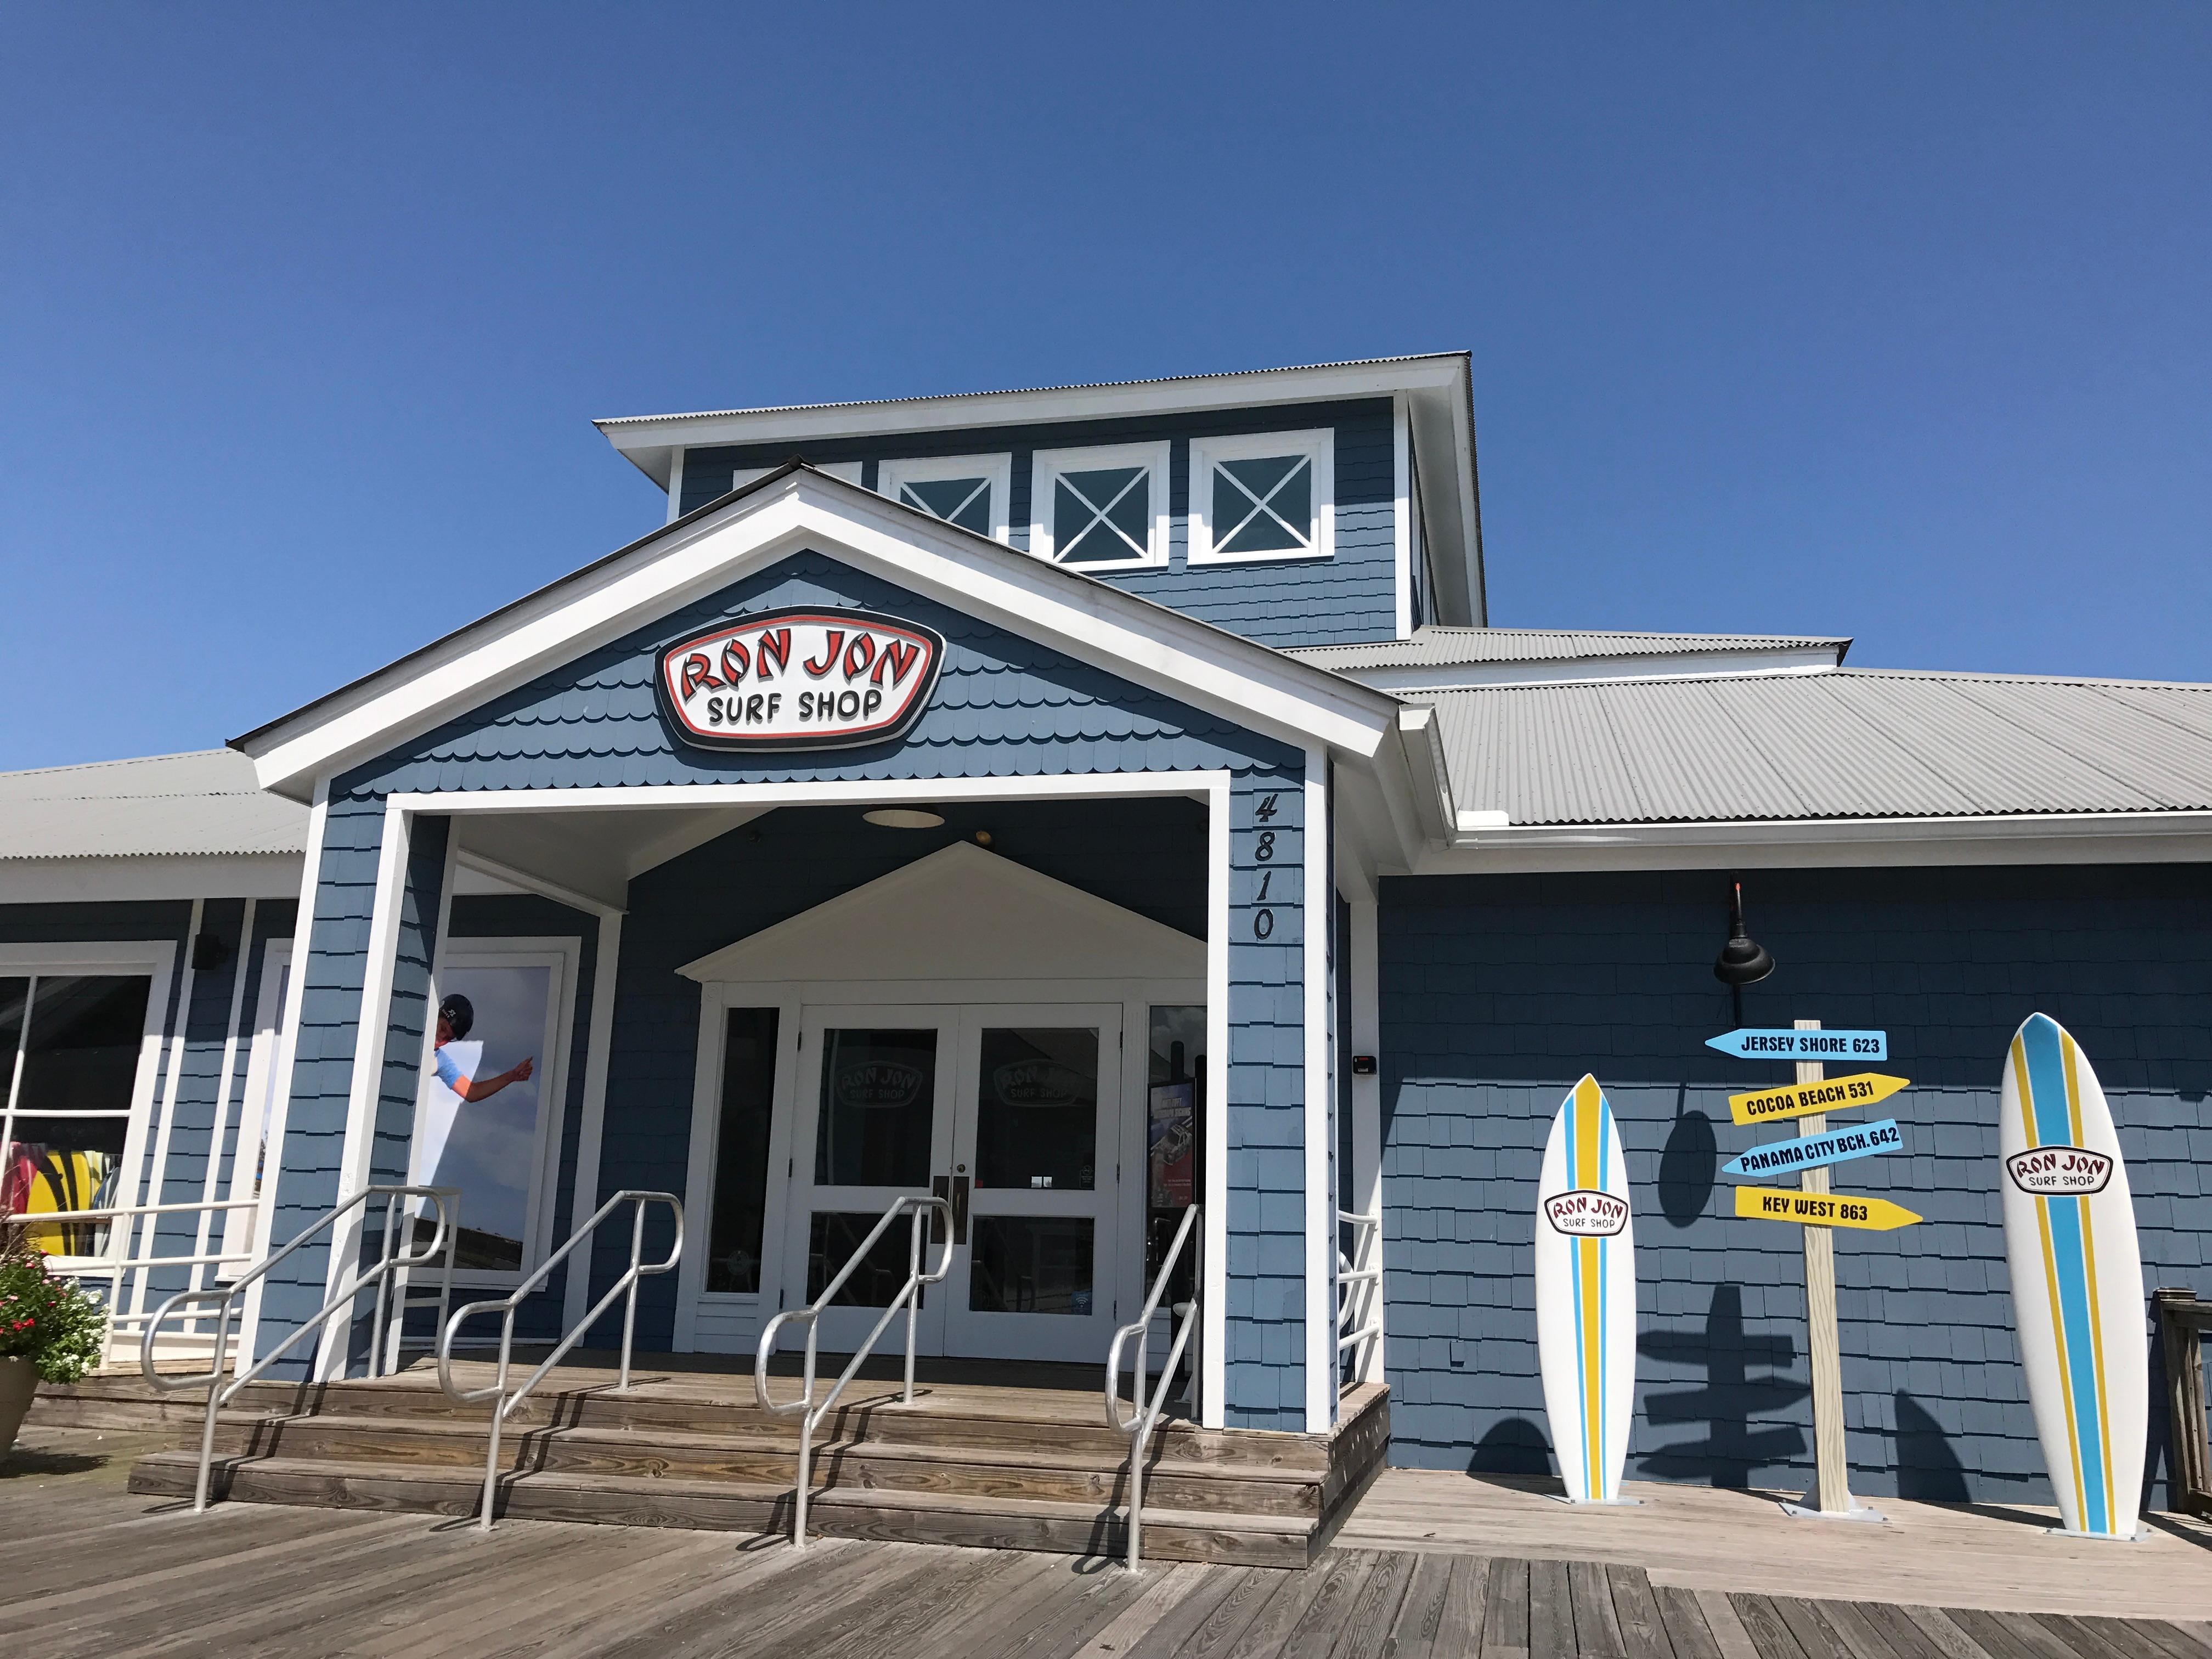 Ron Jon Surf Shop Myrtle Beach Sc